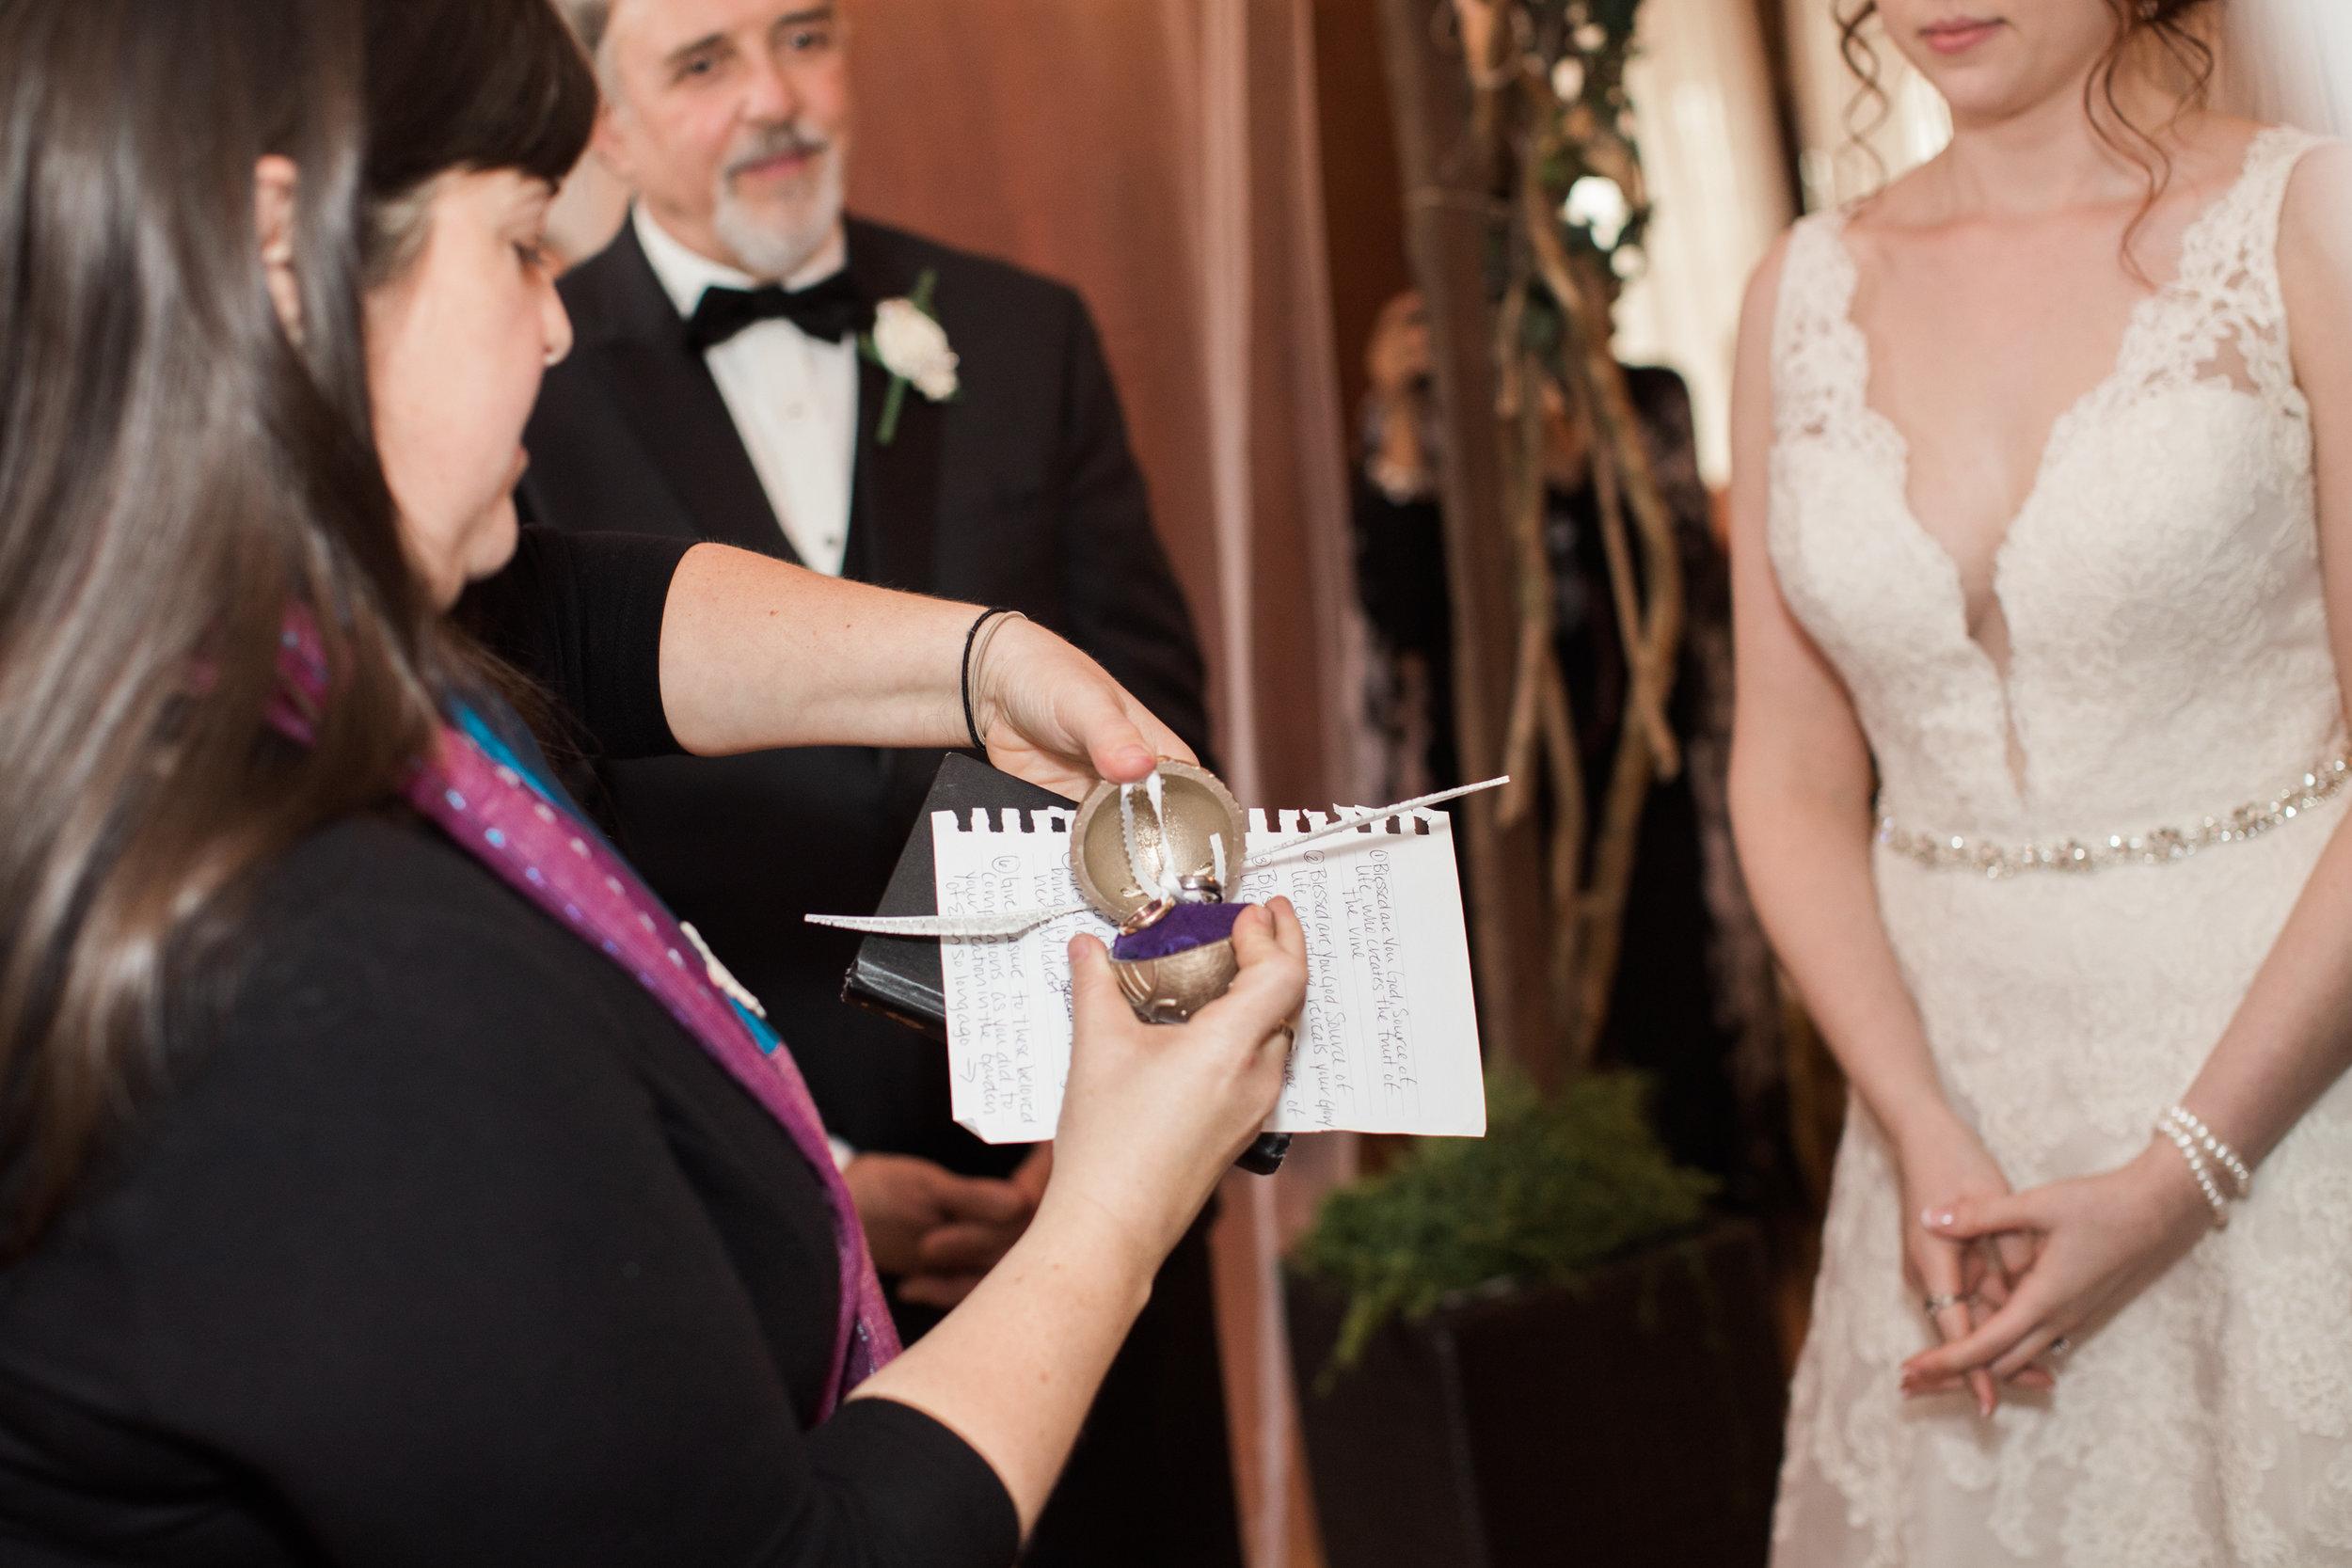 Harry Potter Wedding at Overhills Mansion Catonville Maryland Wedding Photographers Megapixels Media (77 of 134).jpg